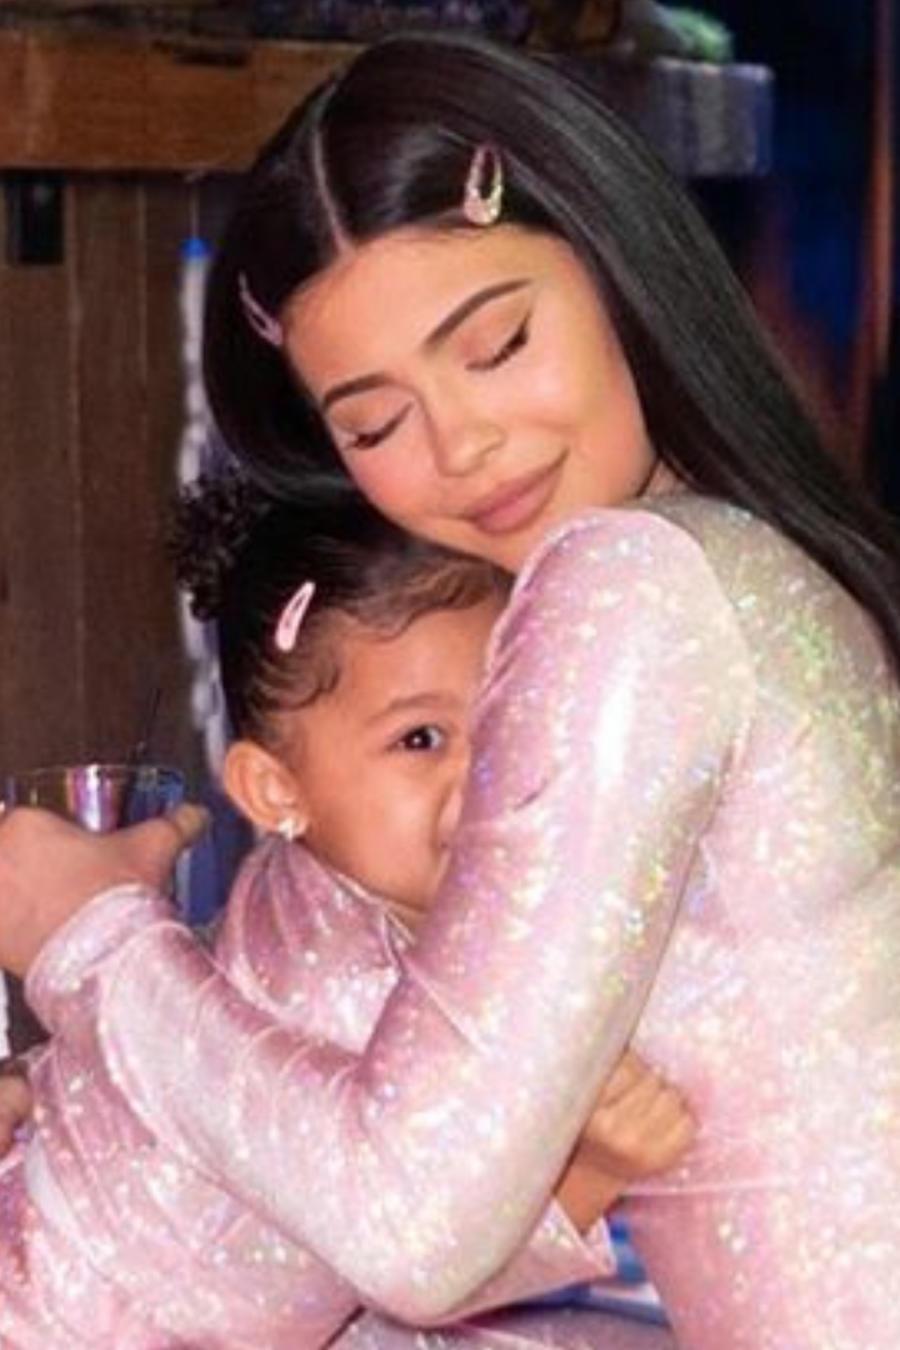 Kylie Jenner abrazando a su hija Stormi